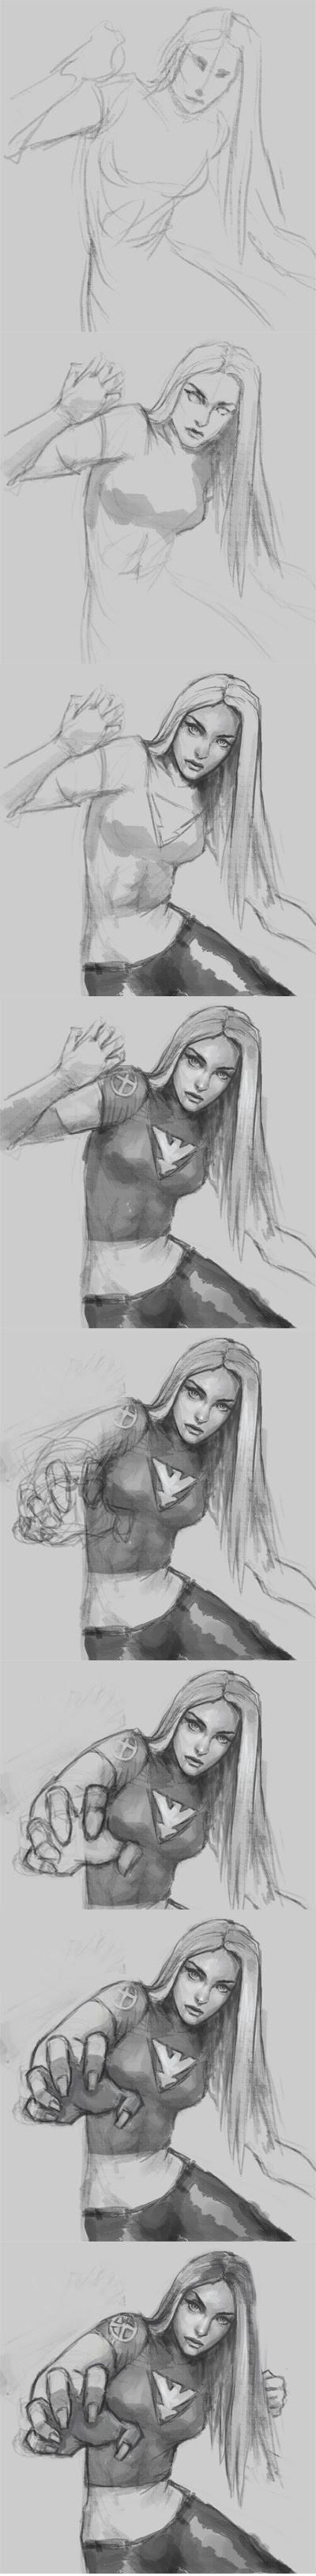 how to draw x-men jean grey